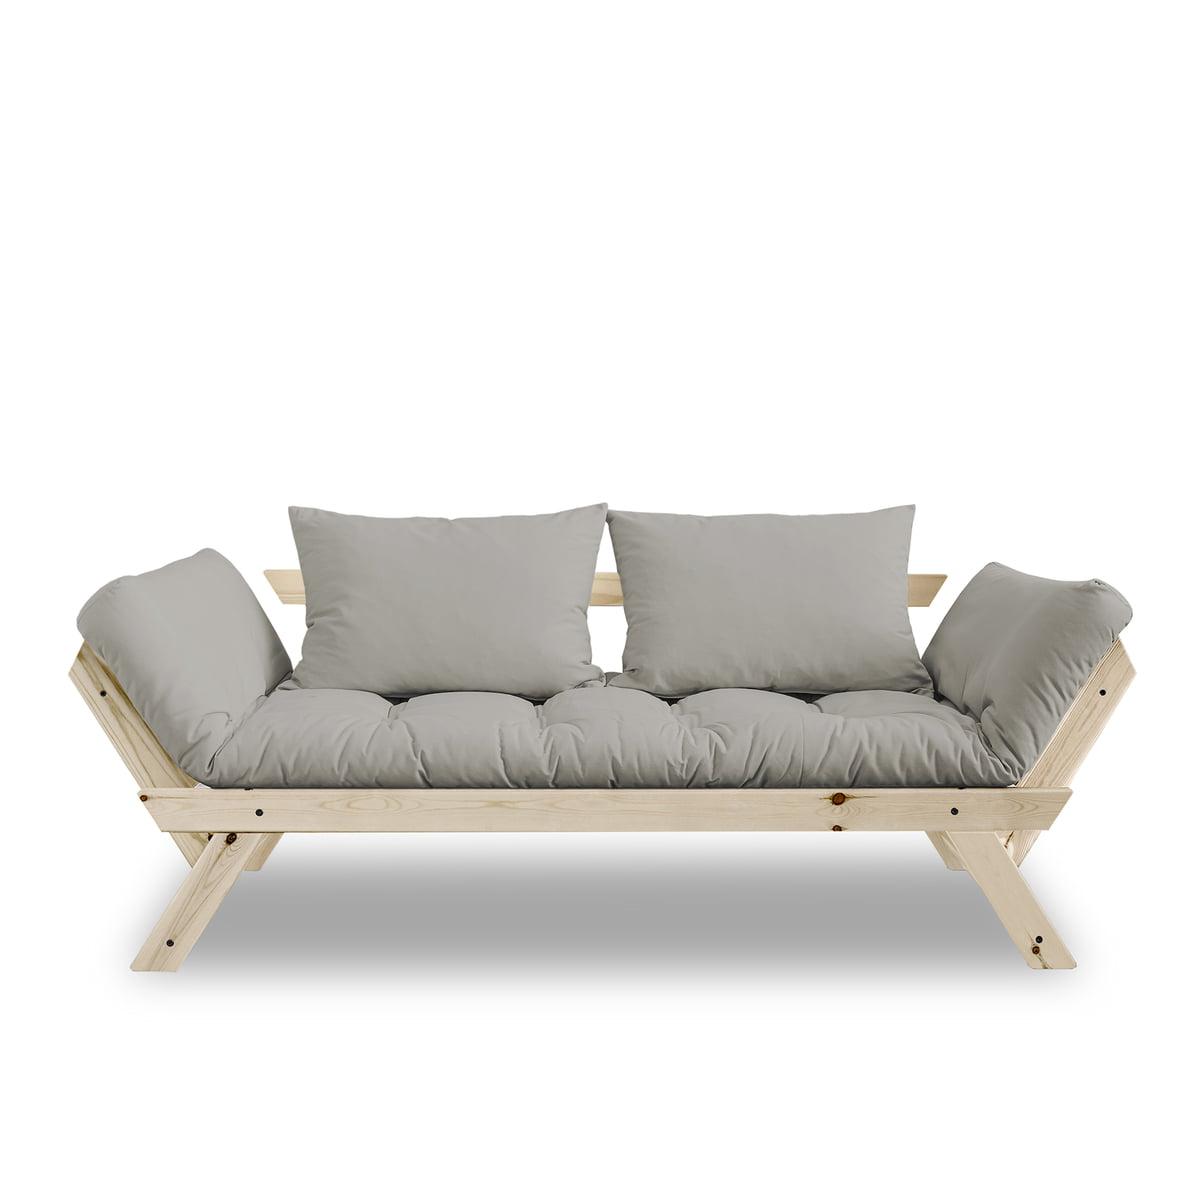 karup bebop sofa kiefer natur grau grau t 80 h 62 b 180 online kaufen bei woonio. Black Bedroom Furniture Sets. Home Design Ideas